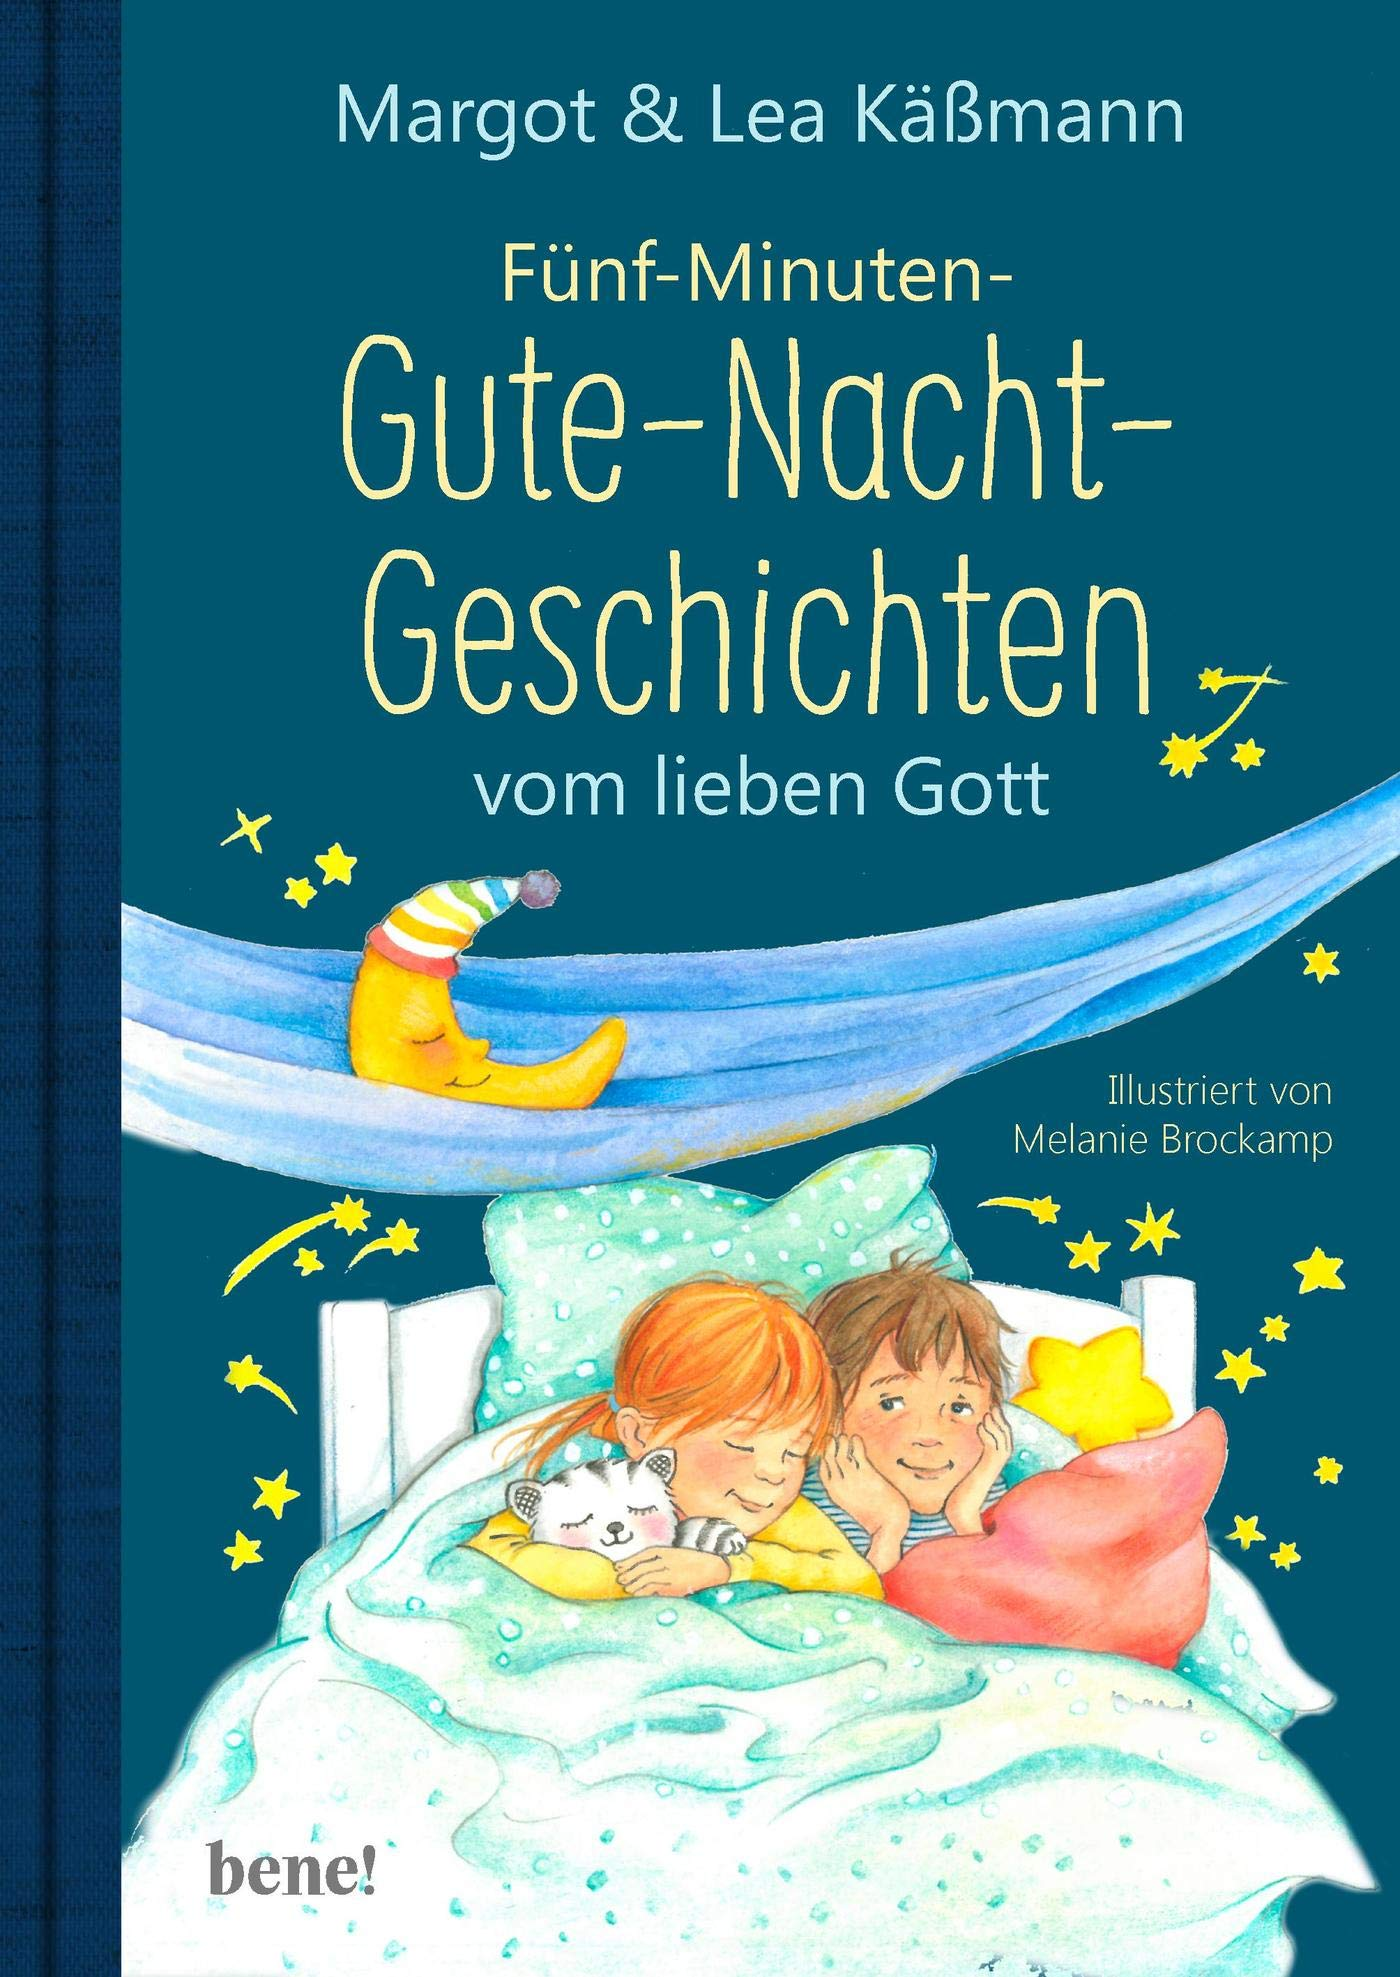 Gutenachtgeschichten Lea und Margot Käßmann